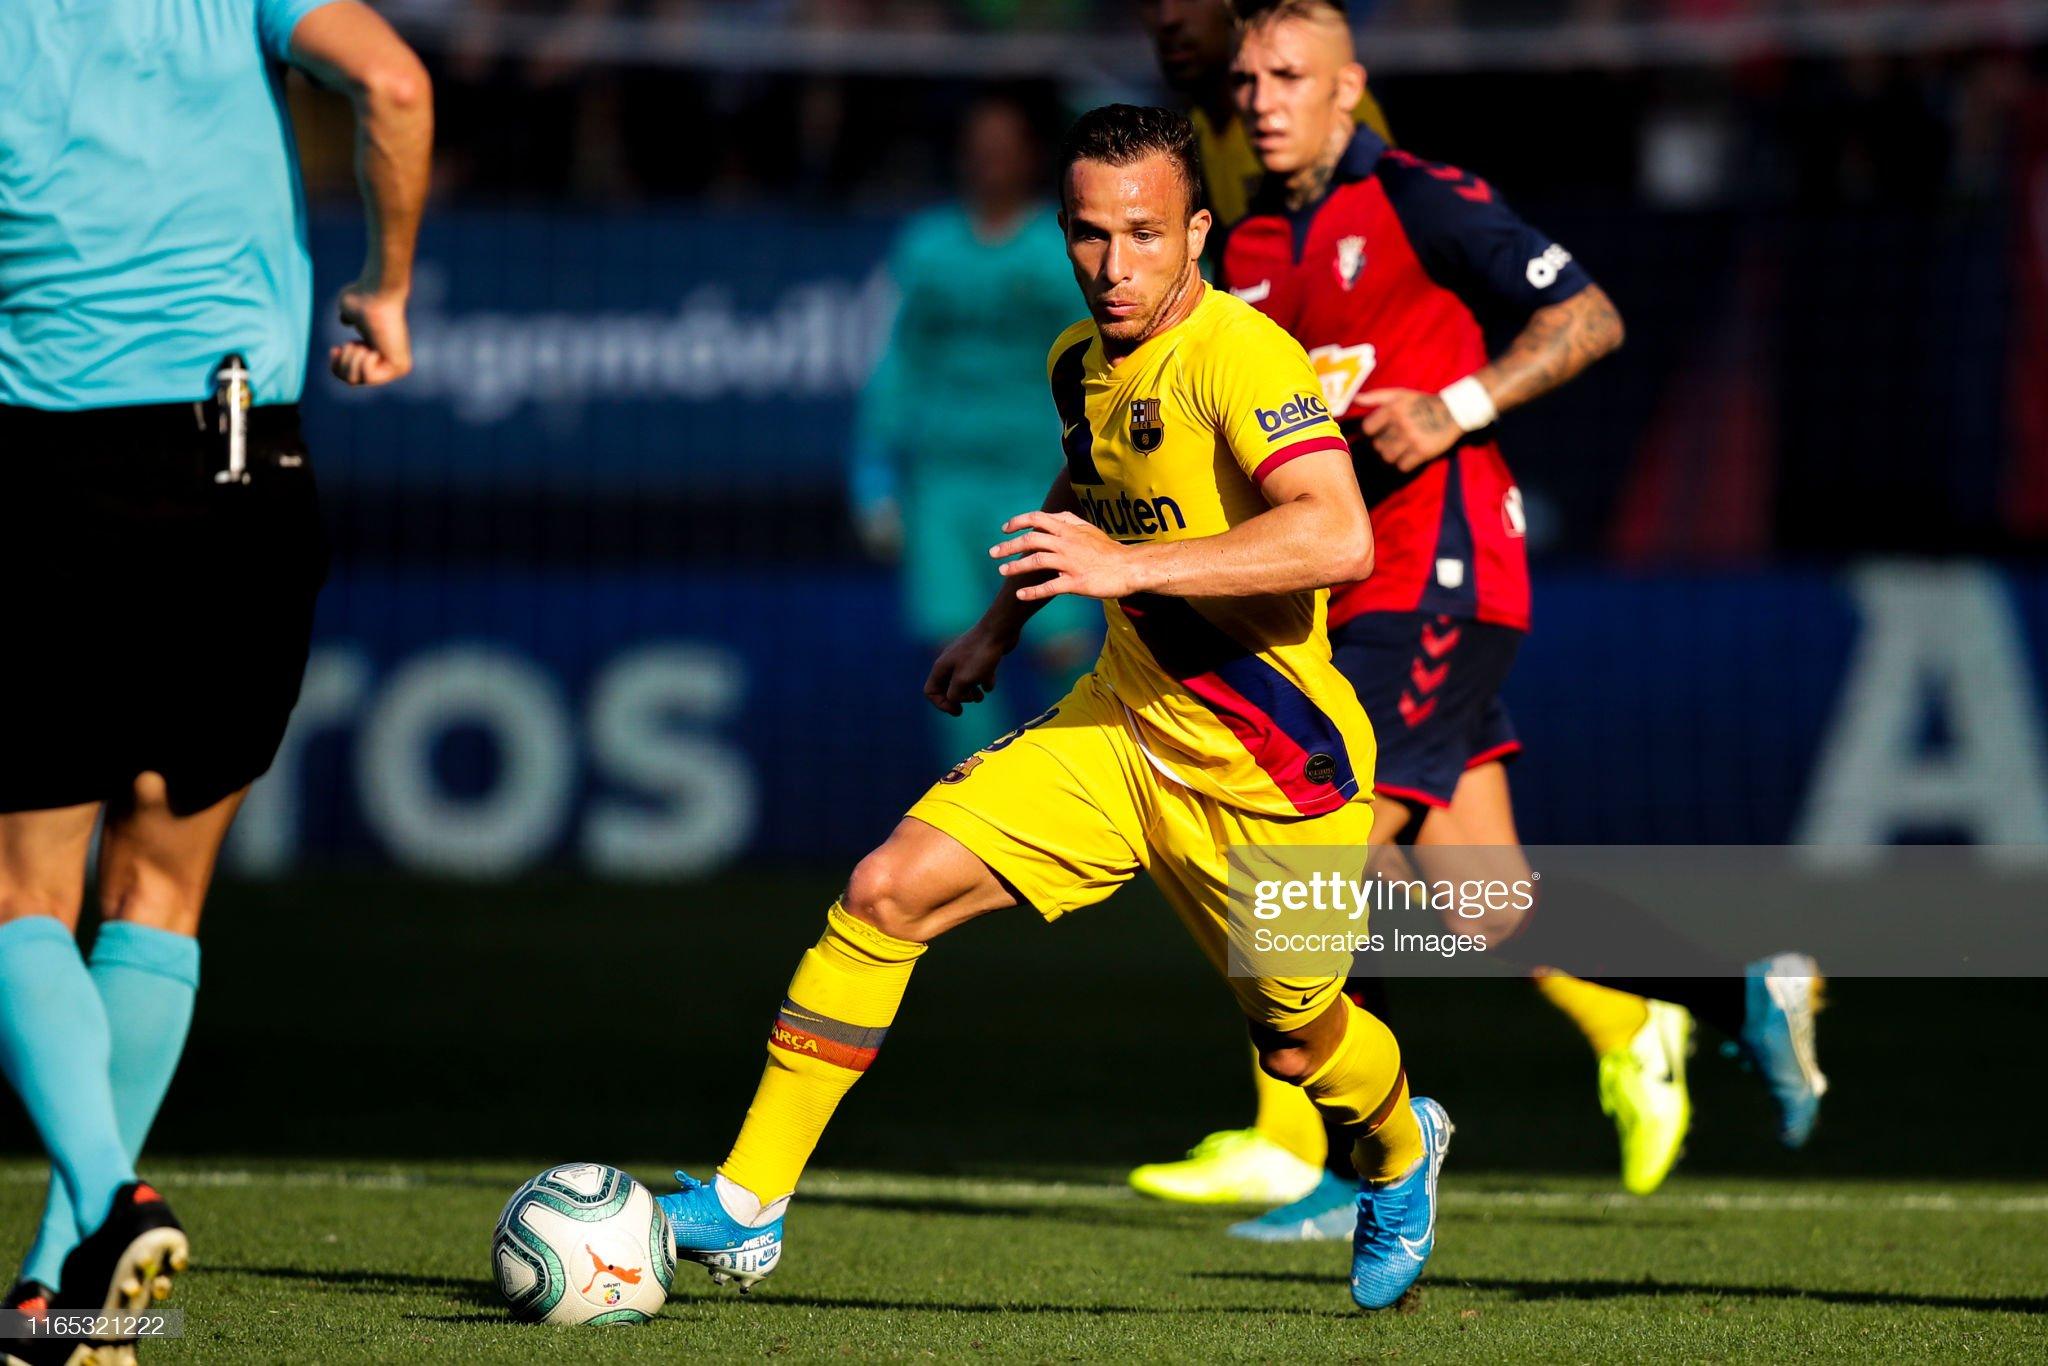 صور مباراة : أوساسونا - برشلونة 2-2 ( 31-08-2019 )  Arthur-of-fc-barcelona-during-the-la-liga-santander-match-between-v-picture-id1165321222?s=2048x2048